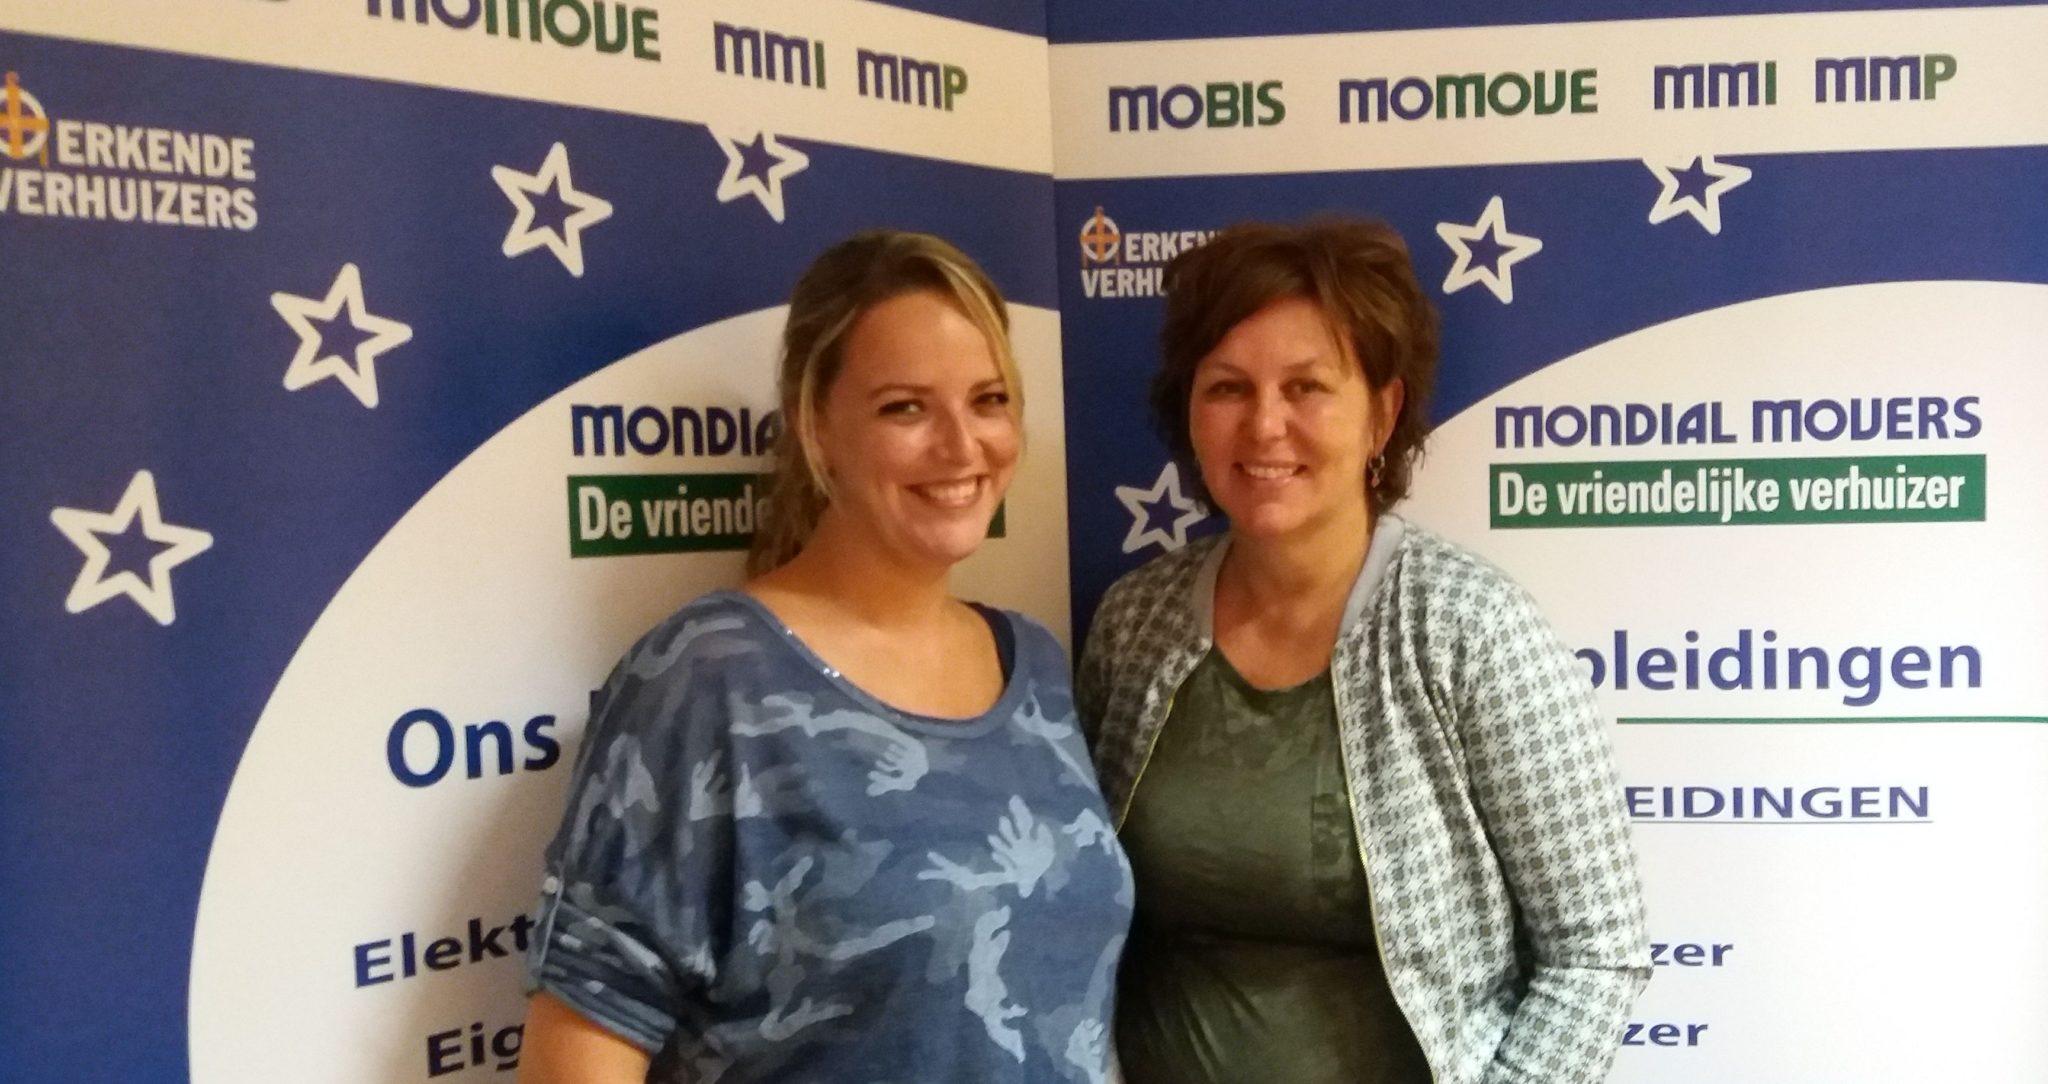 stijging in aantal boekingen Mondial Movers International